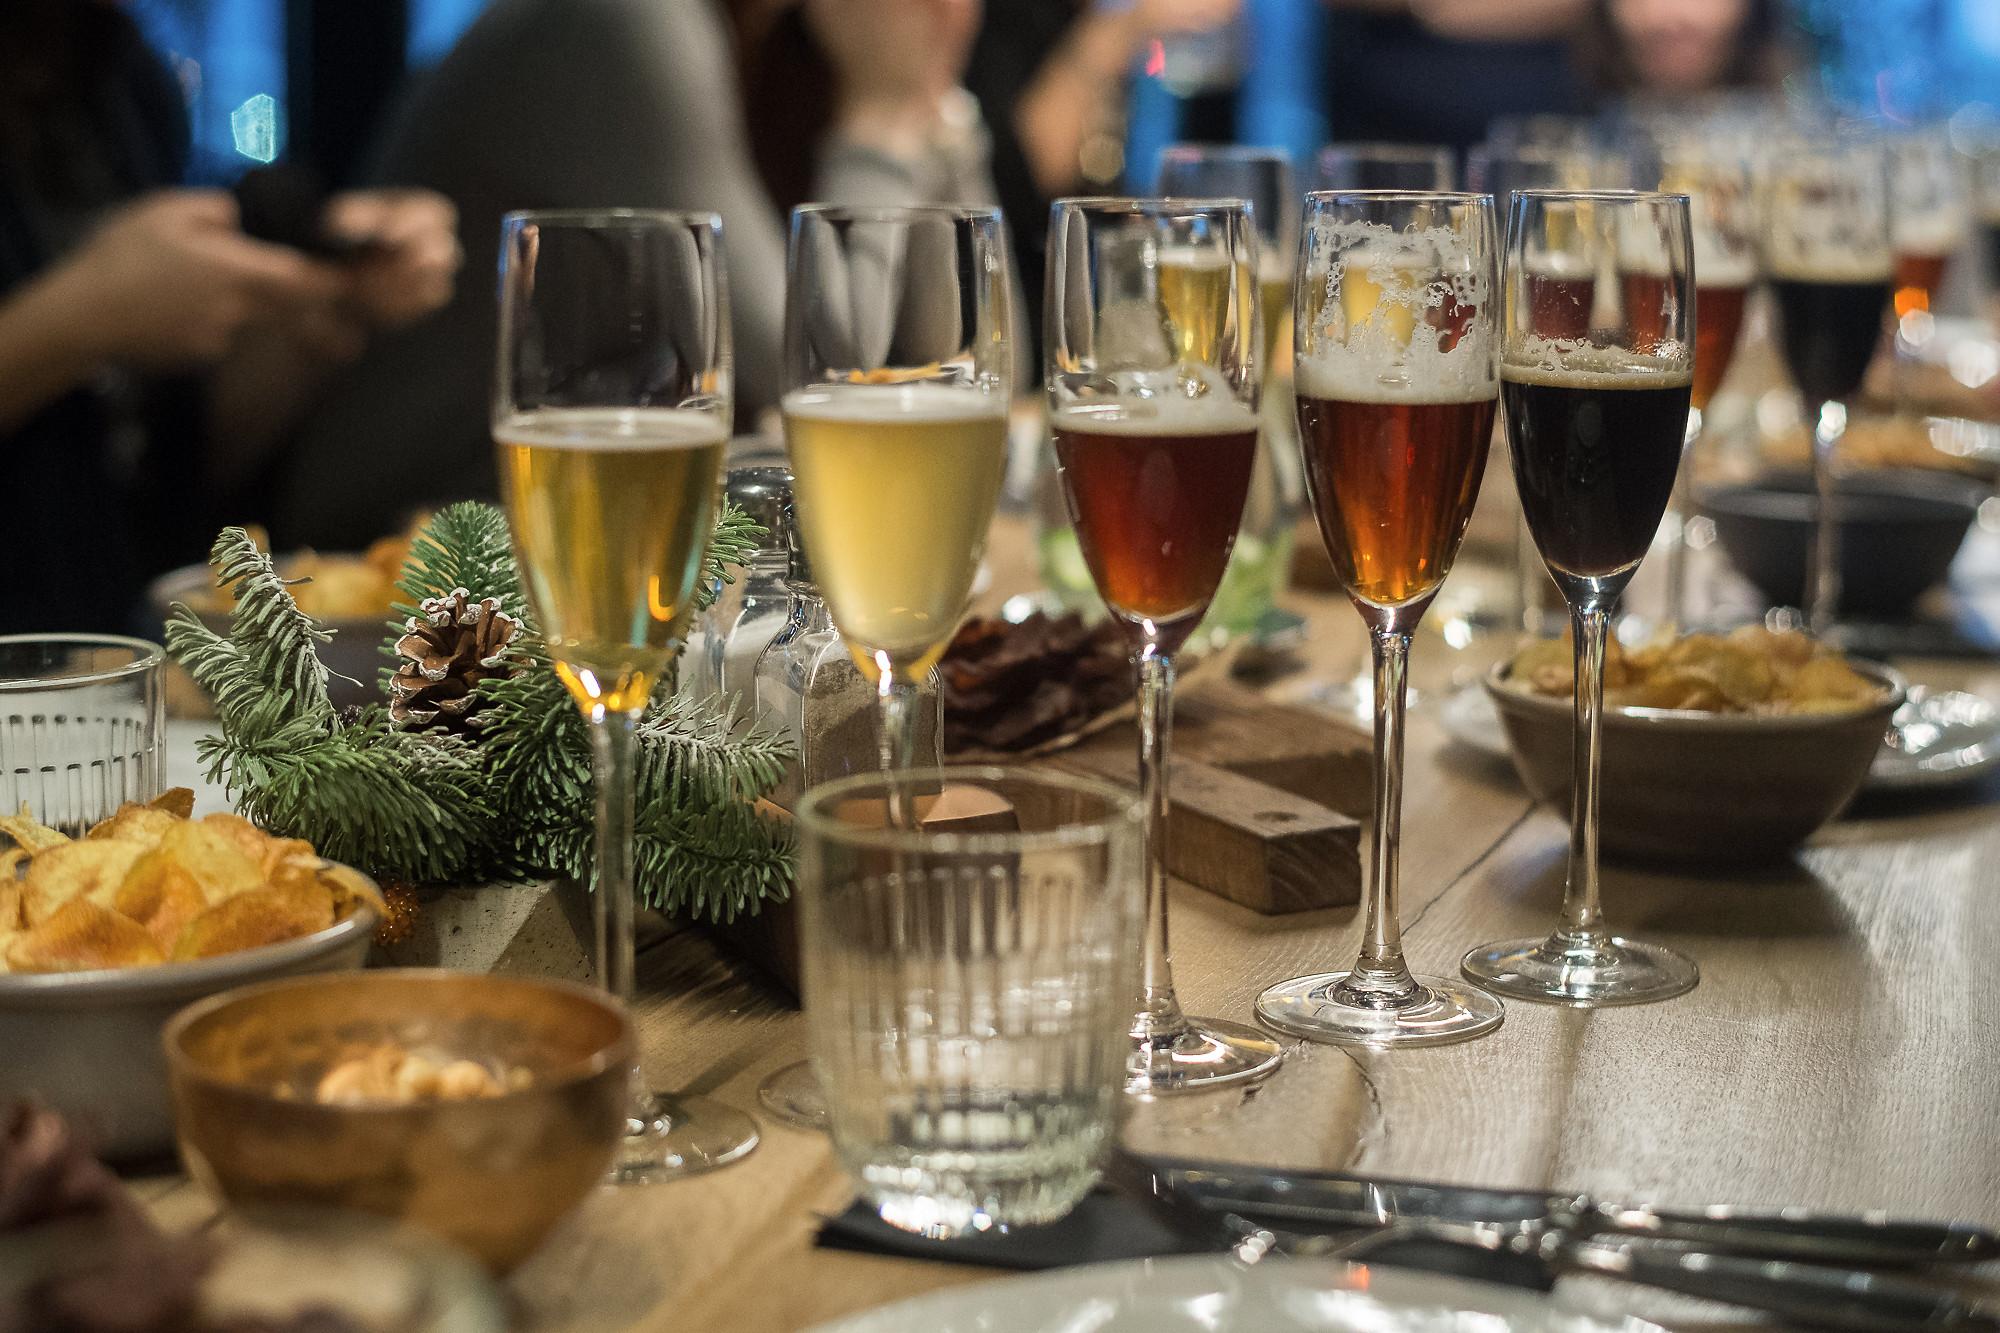 Вечер в ресторане-пивоварне GRUT